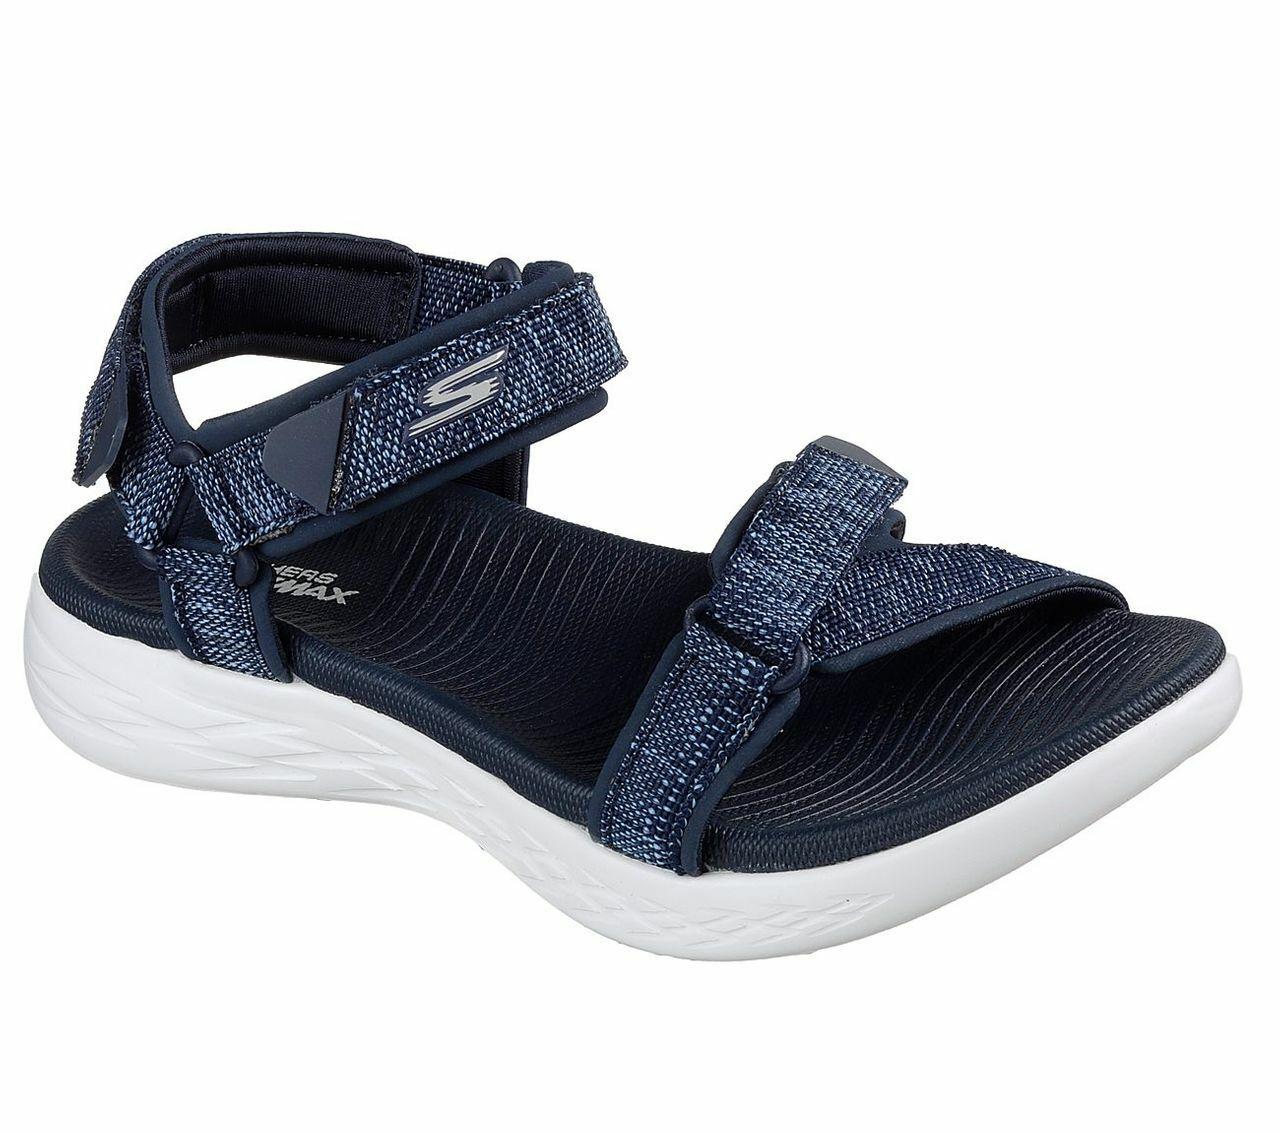 Skechers o-t-g mujer sandals on-the-go 600 radiant sandalias zapatos señora azul